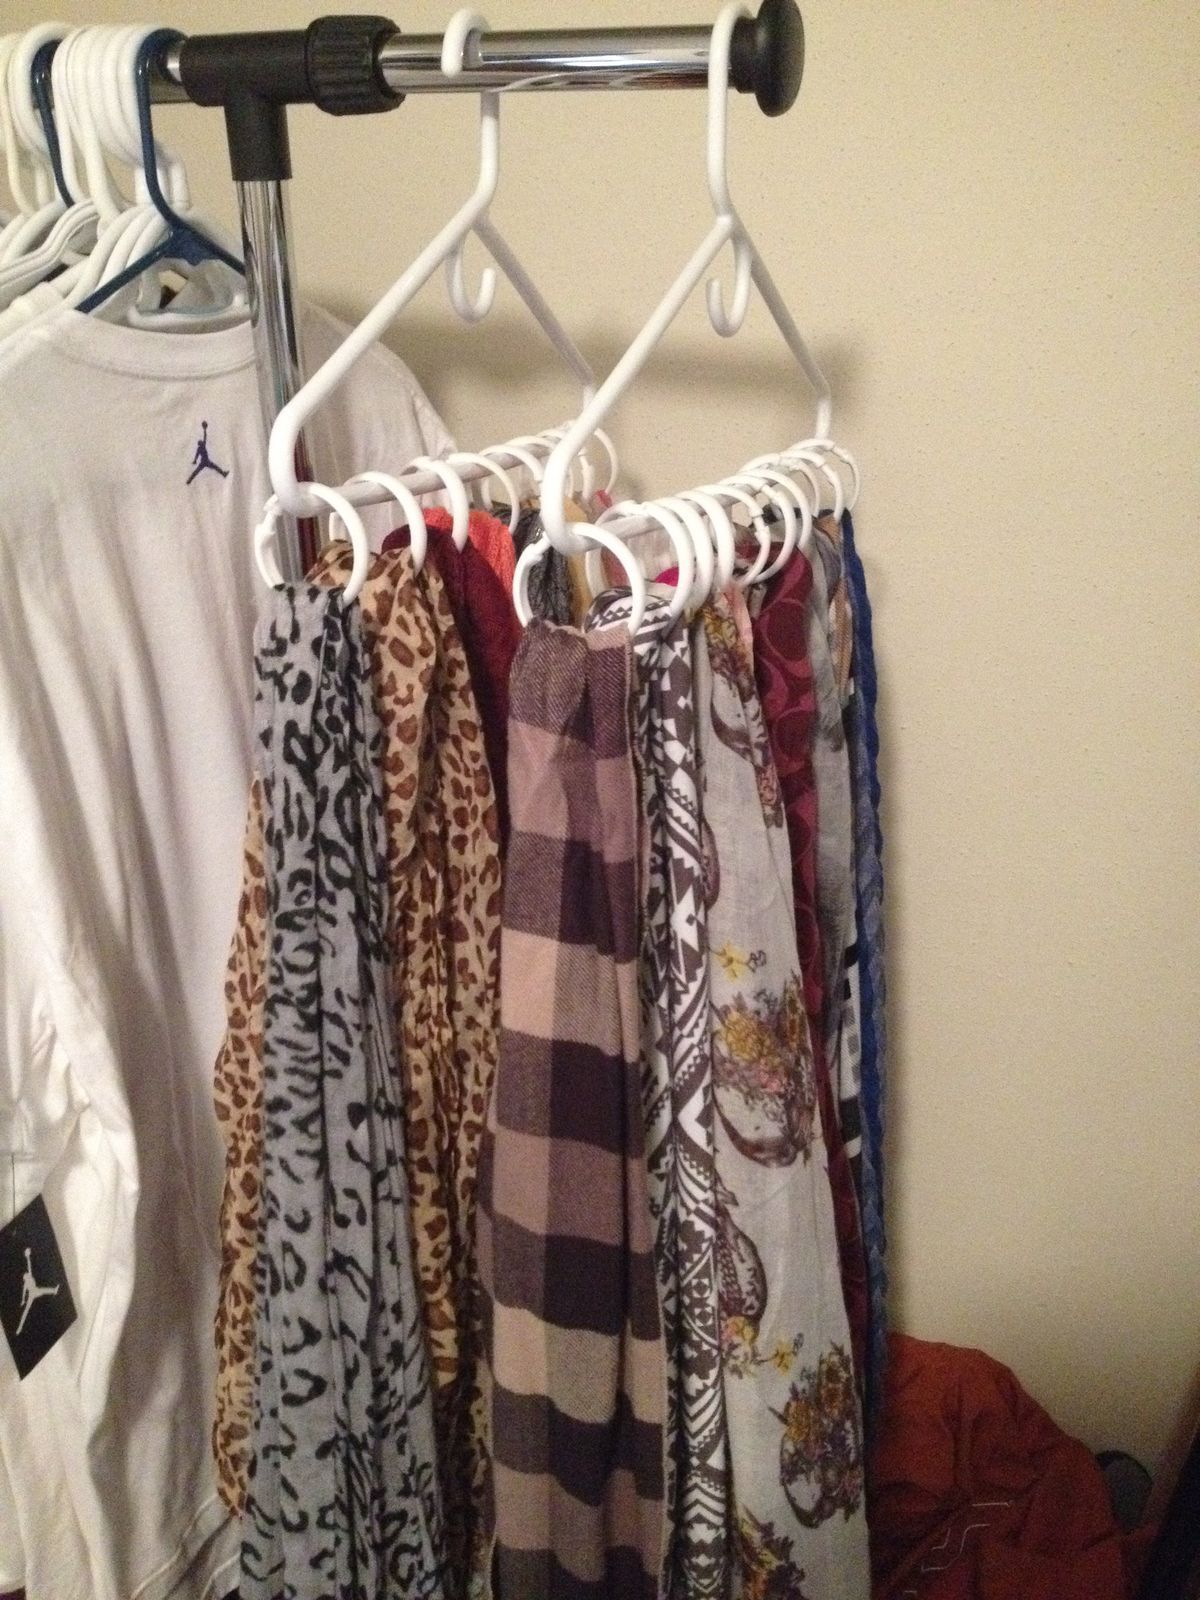 Closet Storage Hacks Clothes